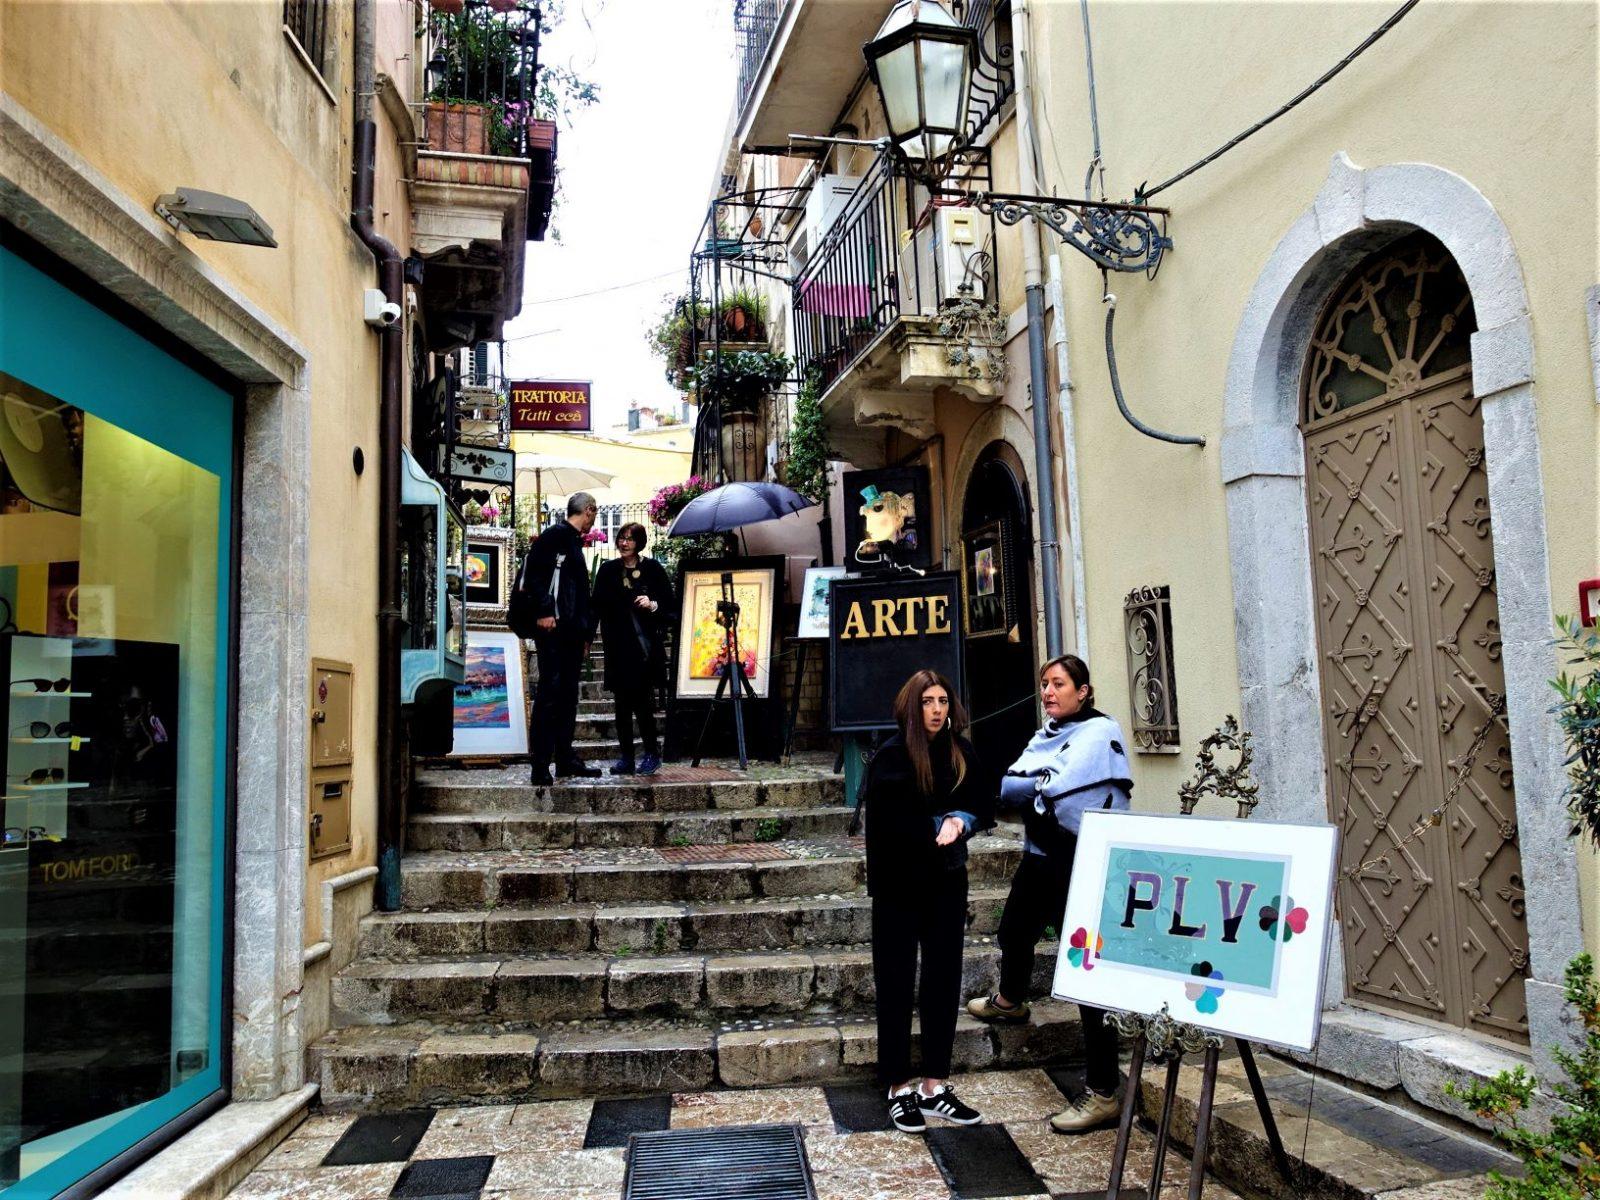 Byen taormina Sicilia